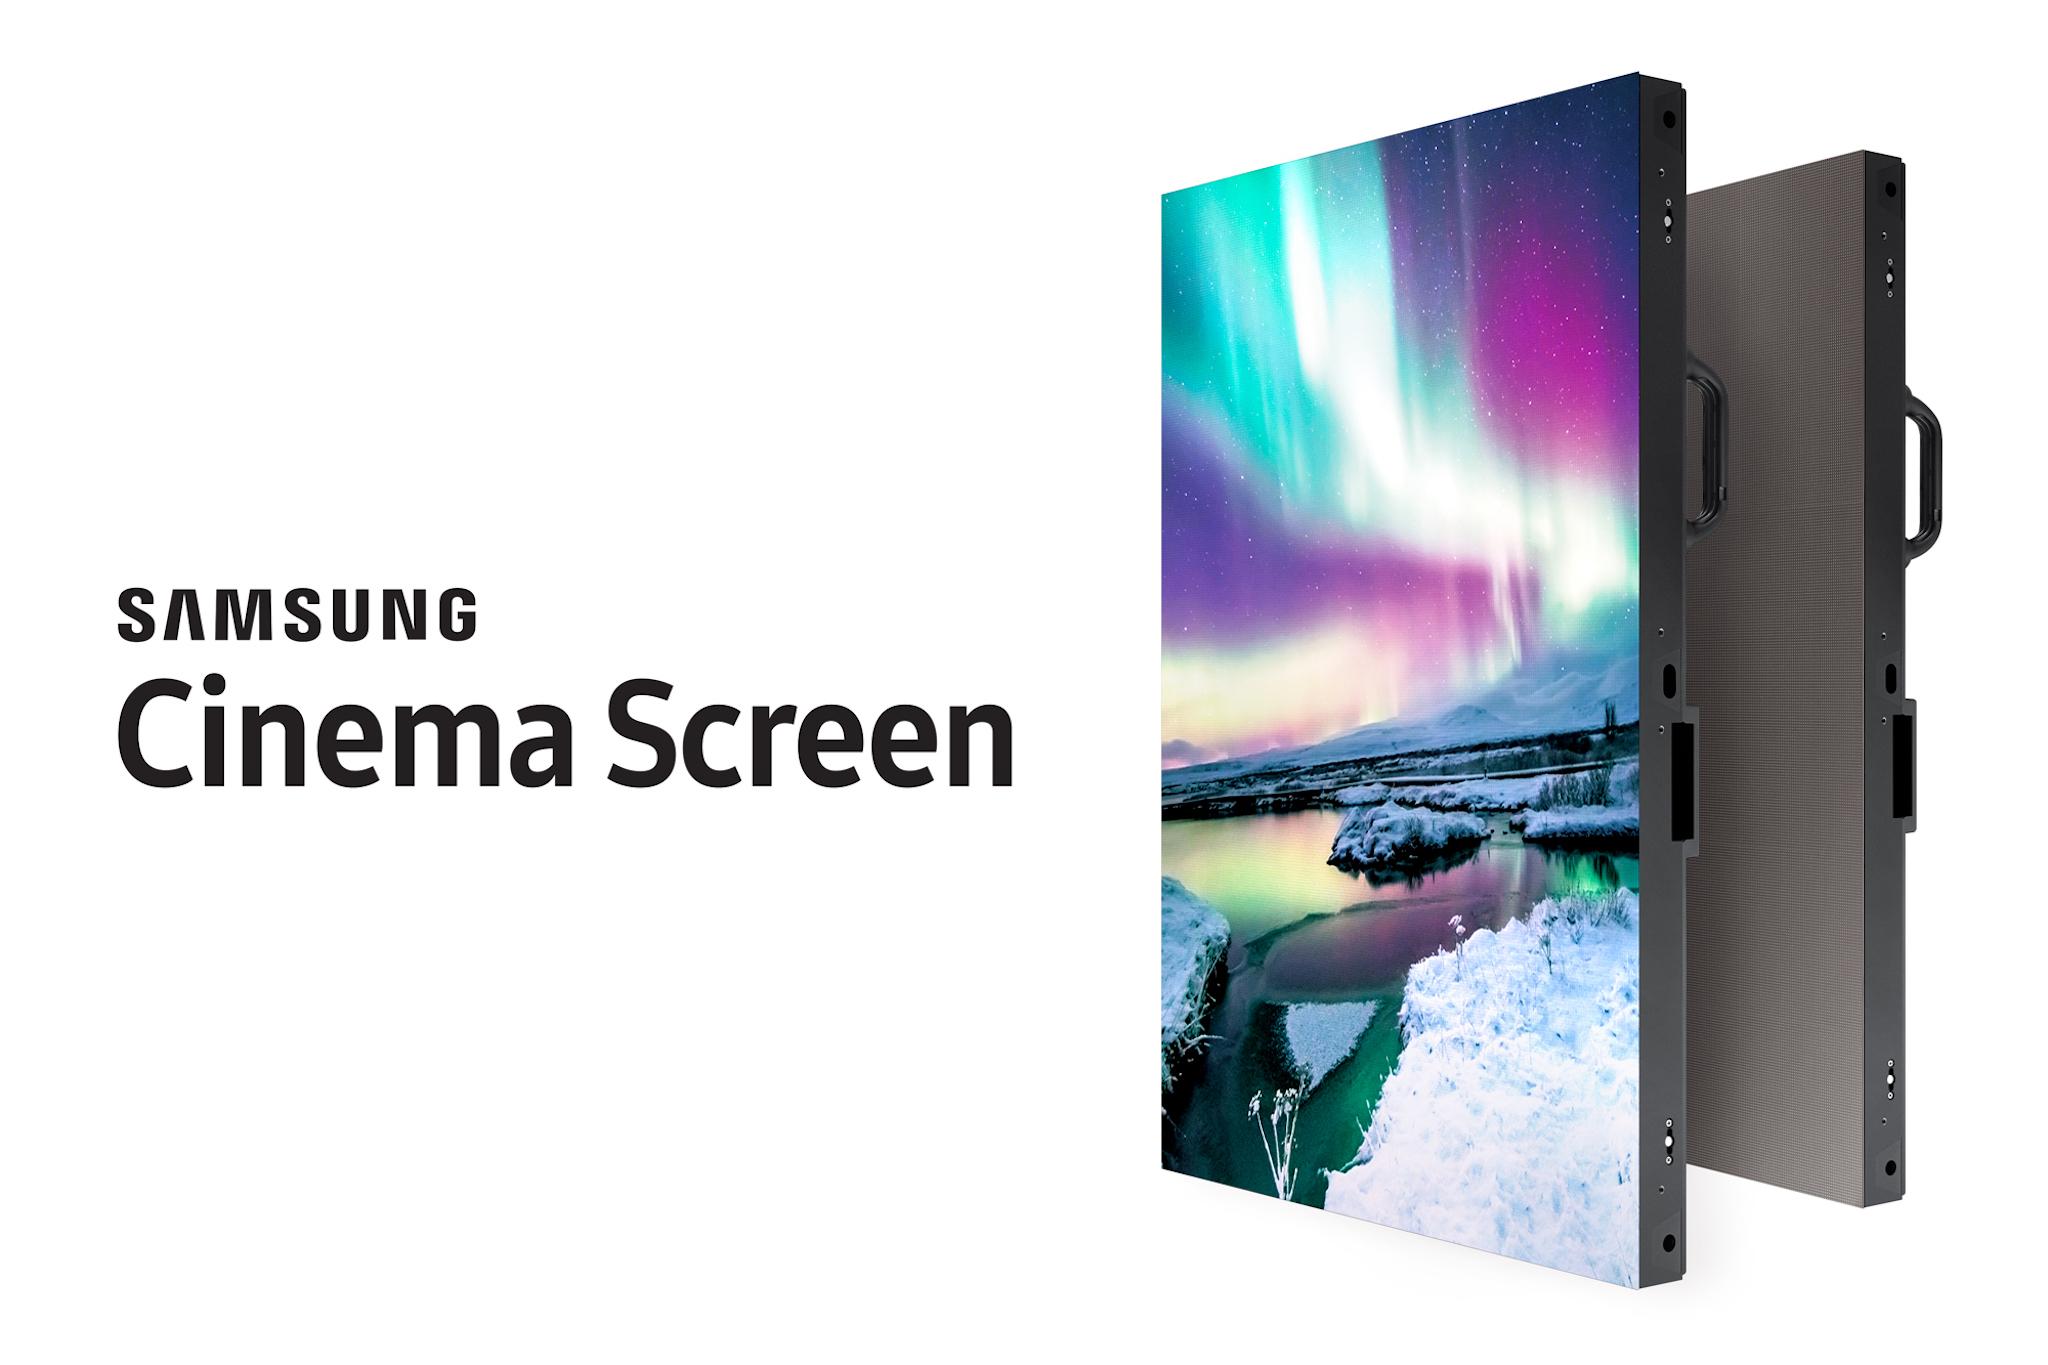 Samsung-Cinema-Screen_004_R-Perspective-2.jpg